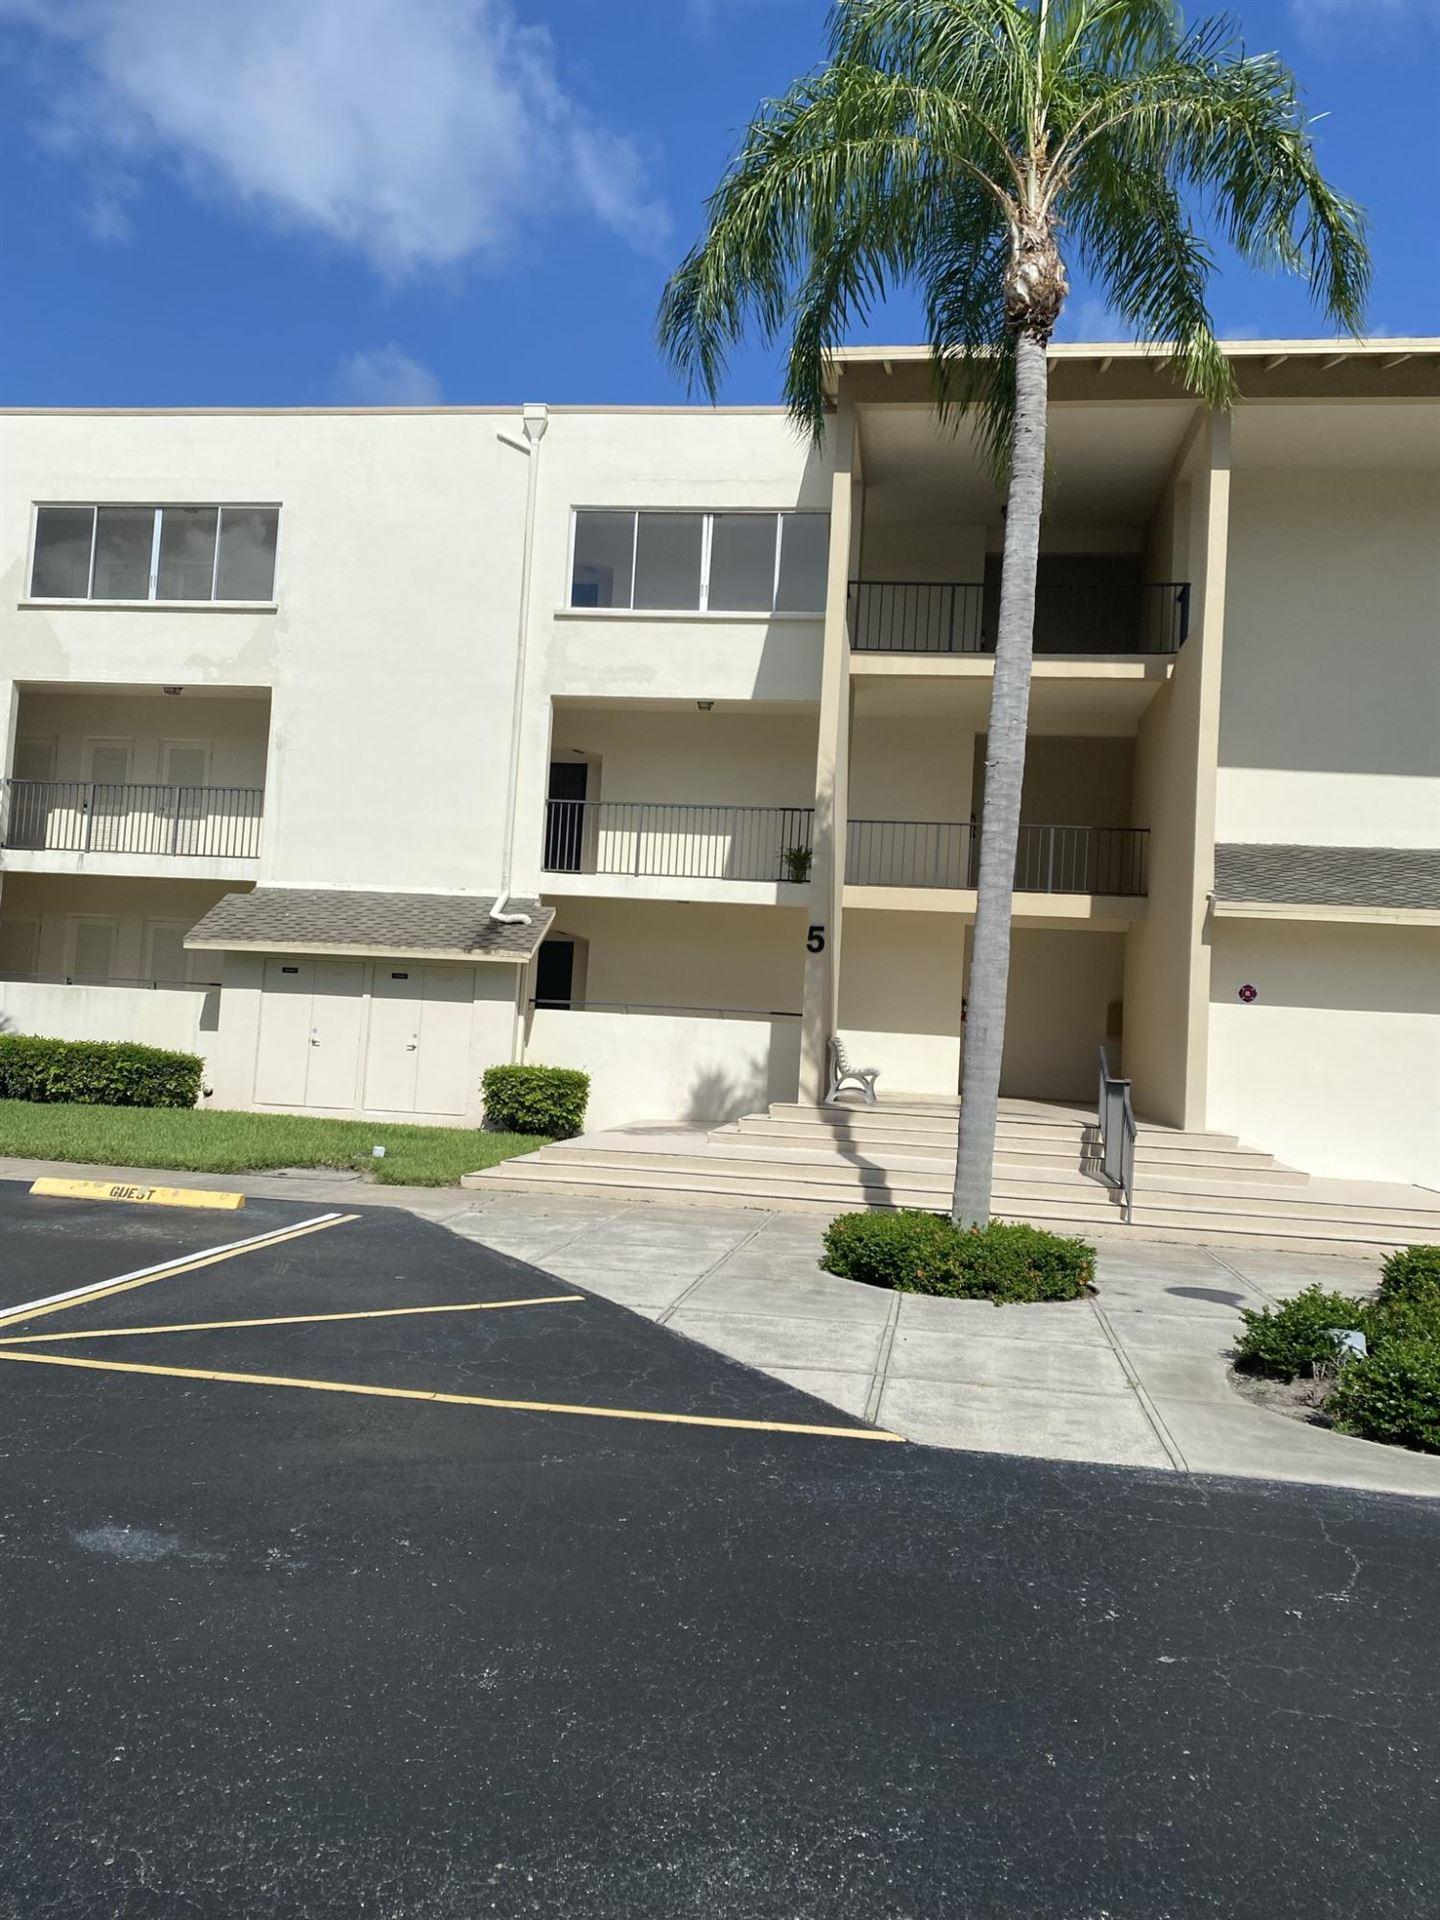 Photo of 11811 Avenue Of P G A #5-3f, Palm Beach Gardens, FL 33418 (MLS # RX-10739328)